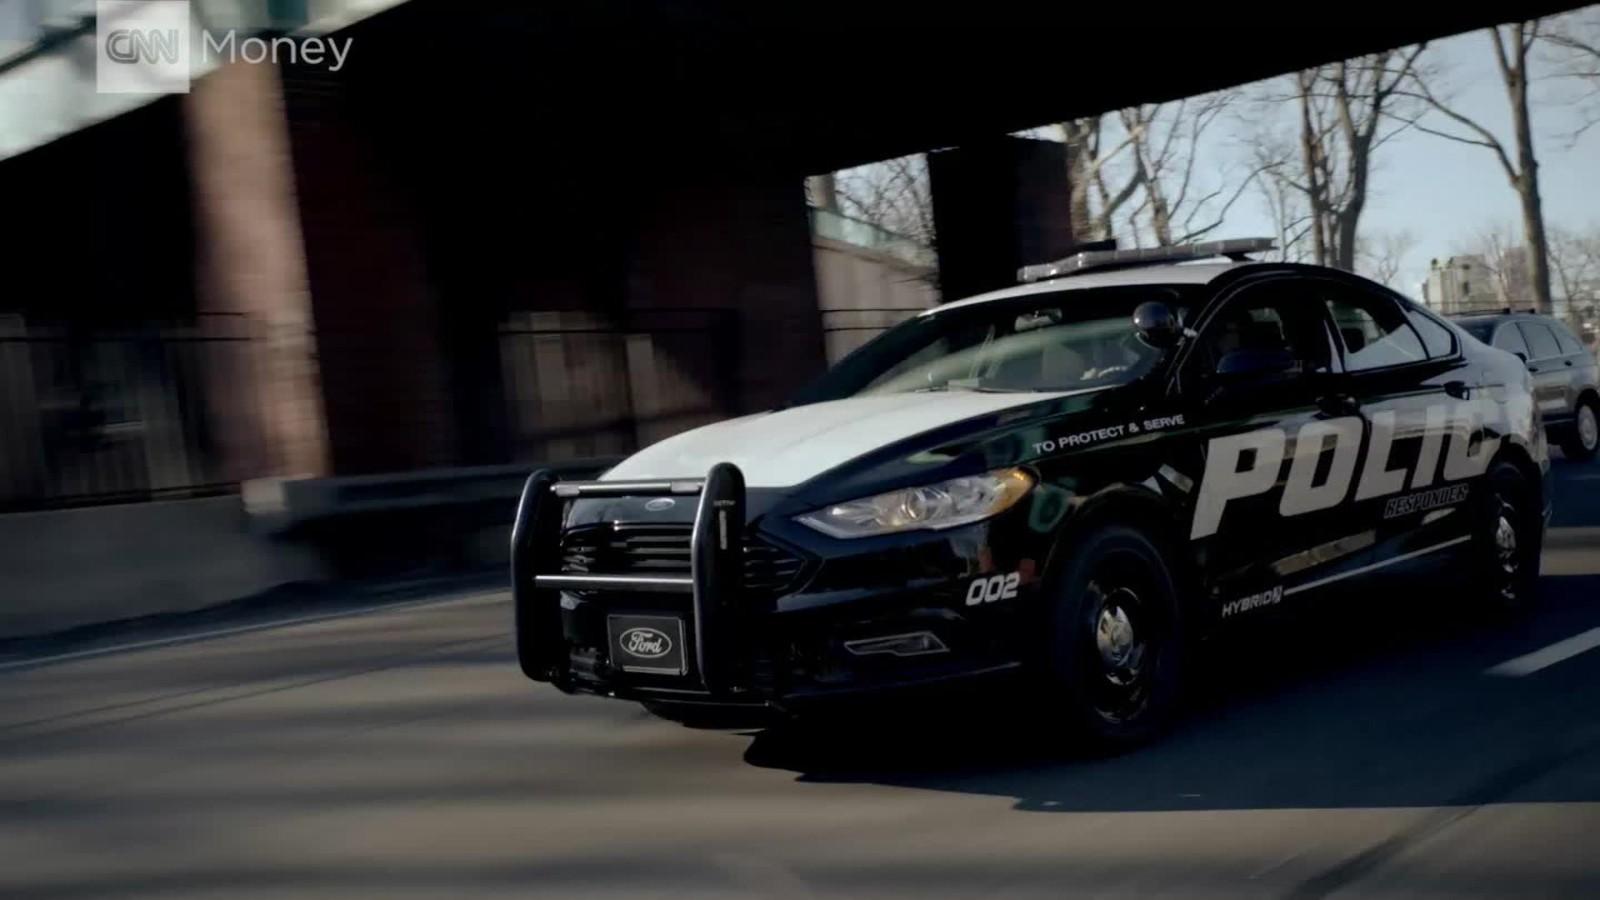 & Ford unveils hybrid police car - CNN Video markmcfarlin.com